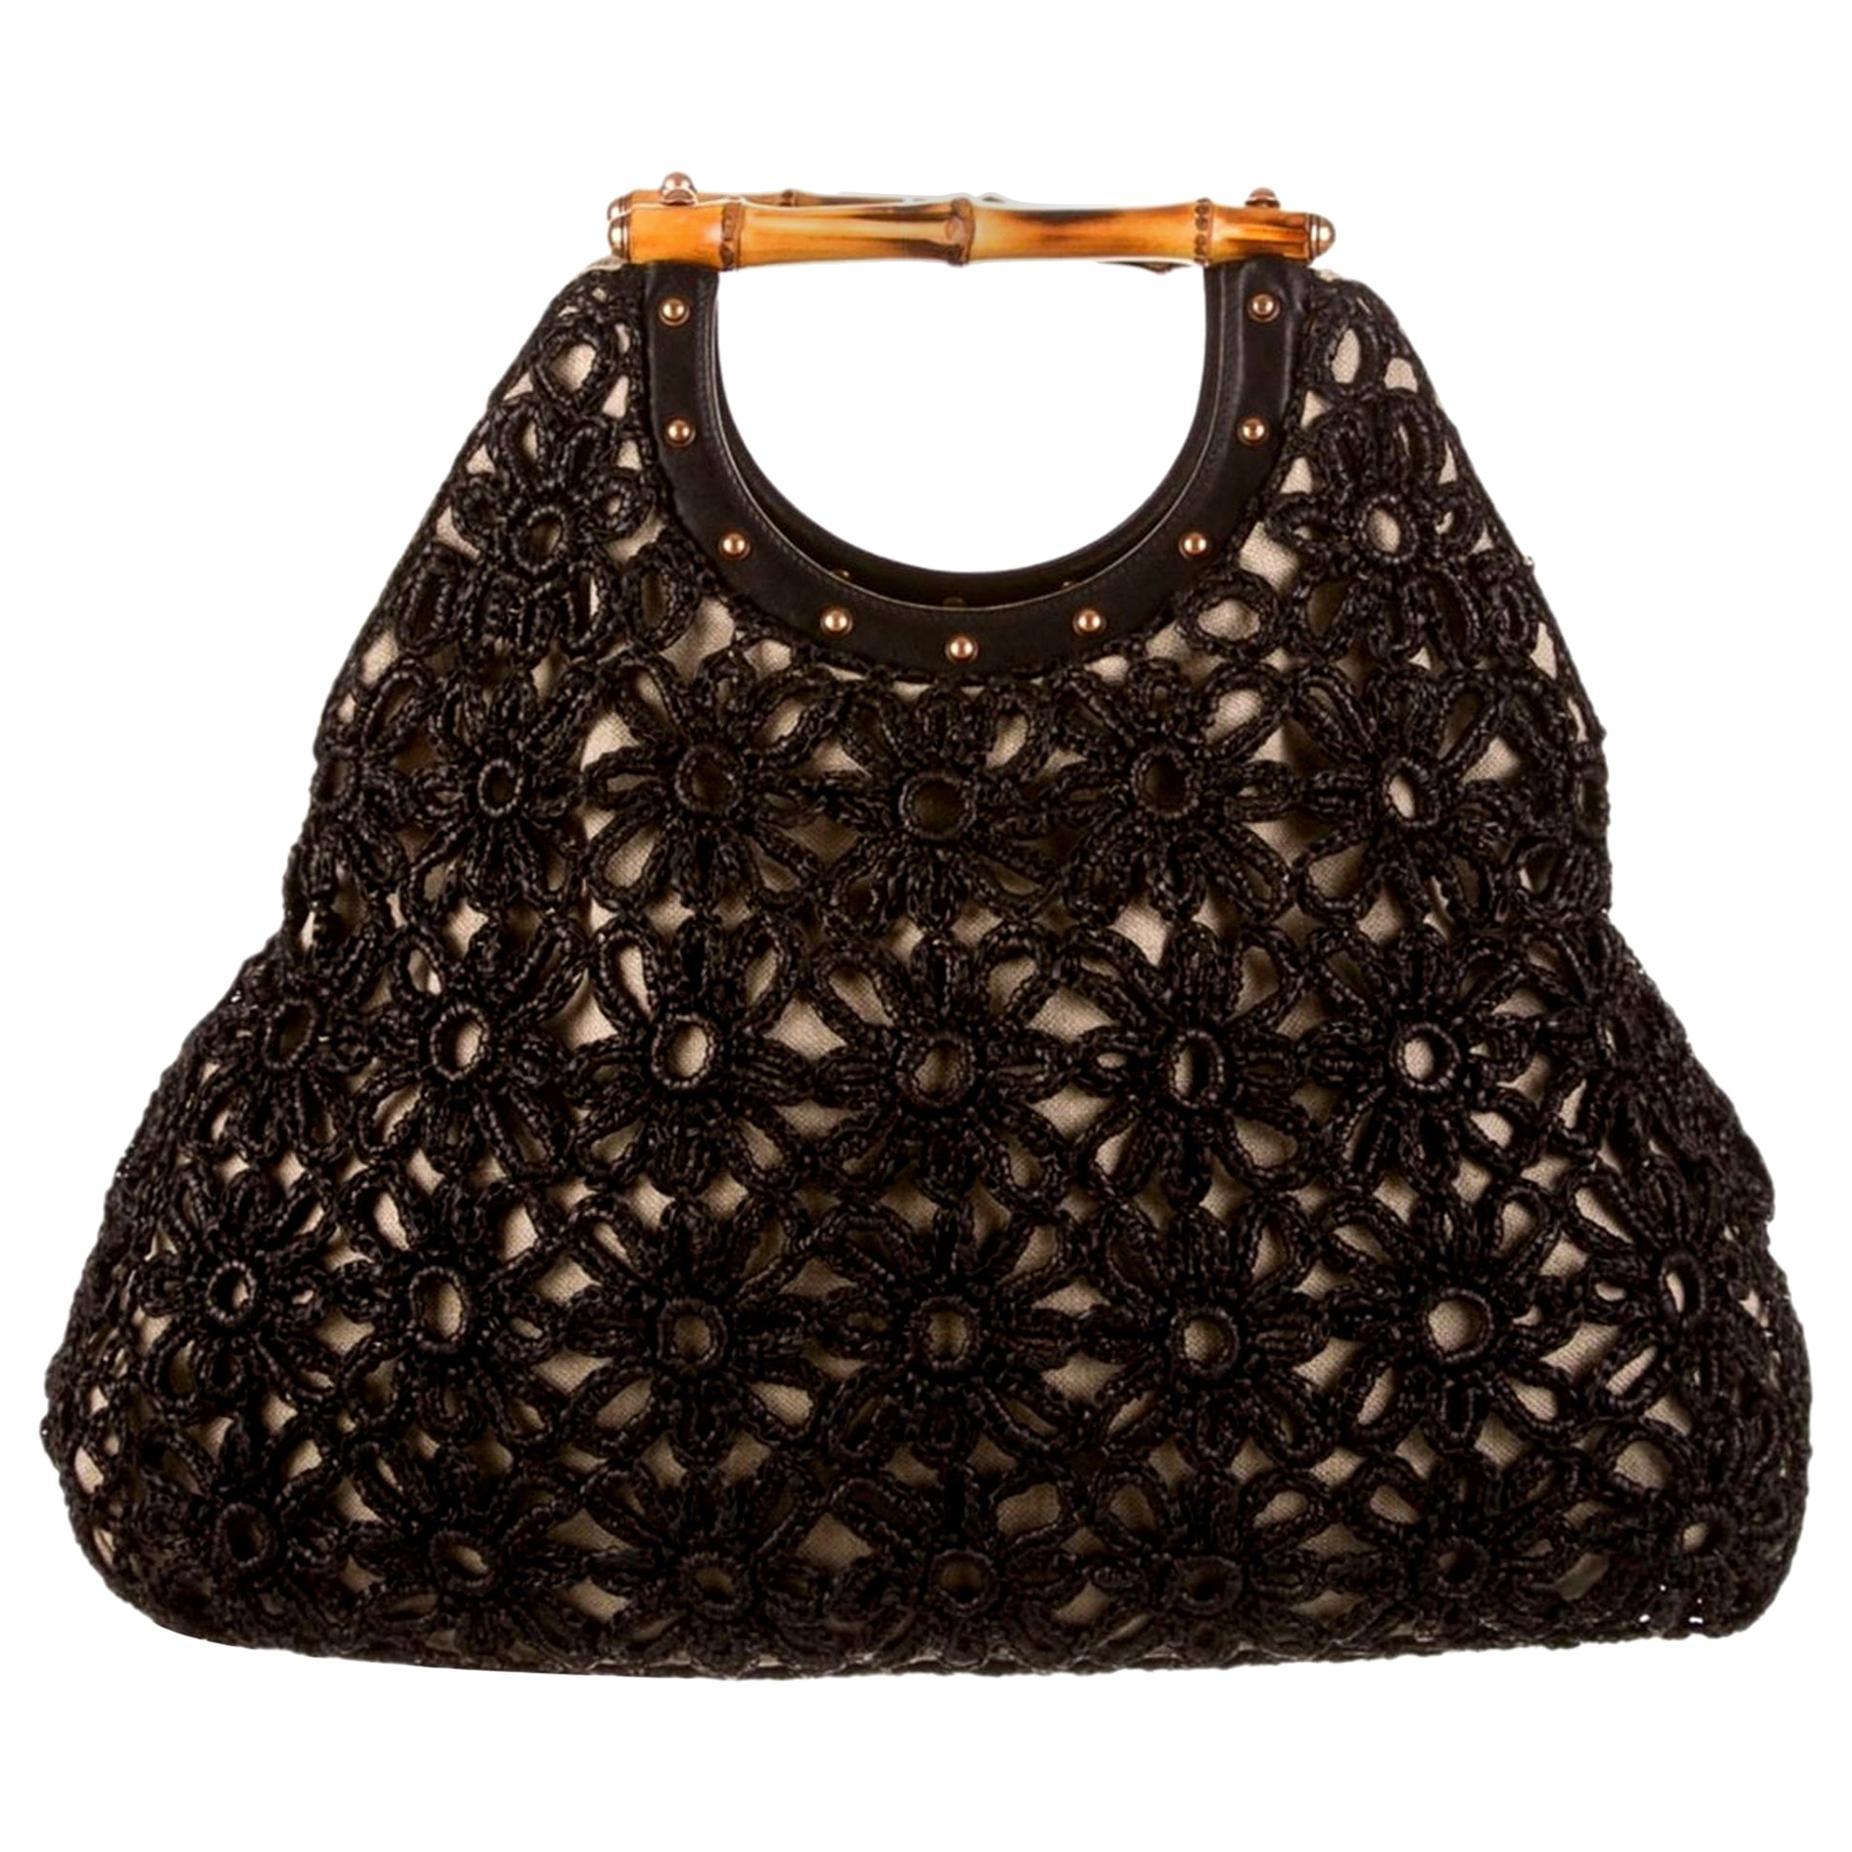 Stunning GUCCI Knitted Leather Macrame Bamboo Handbag Top Handle Bag Tote Studs